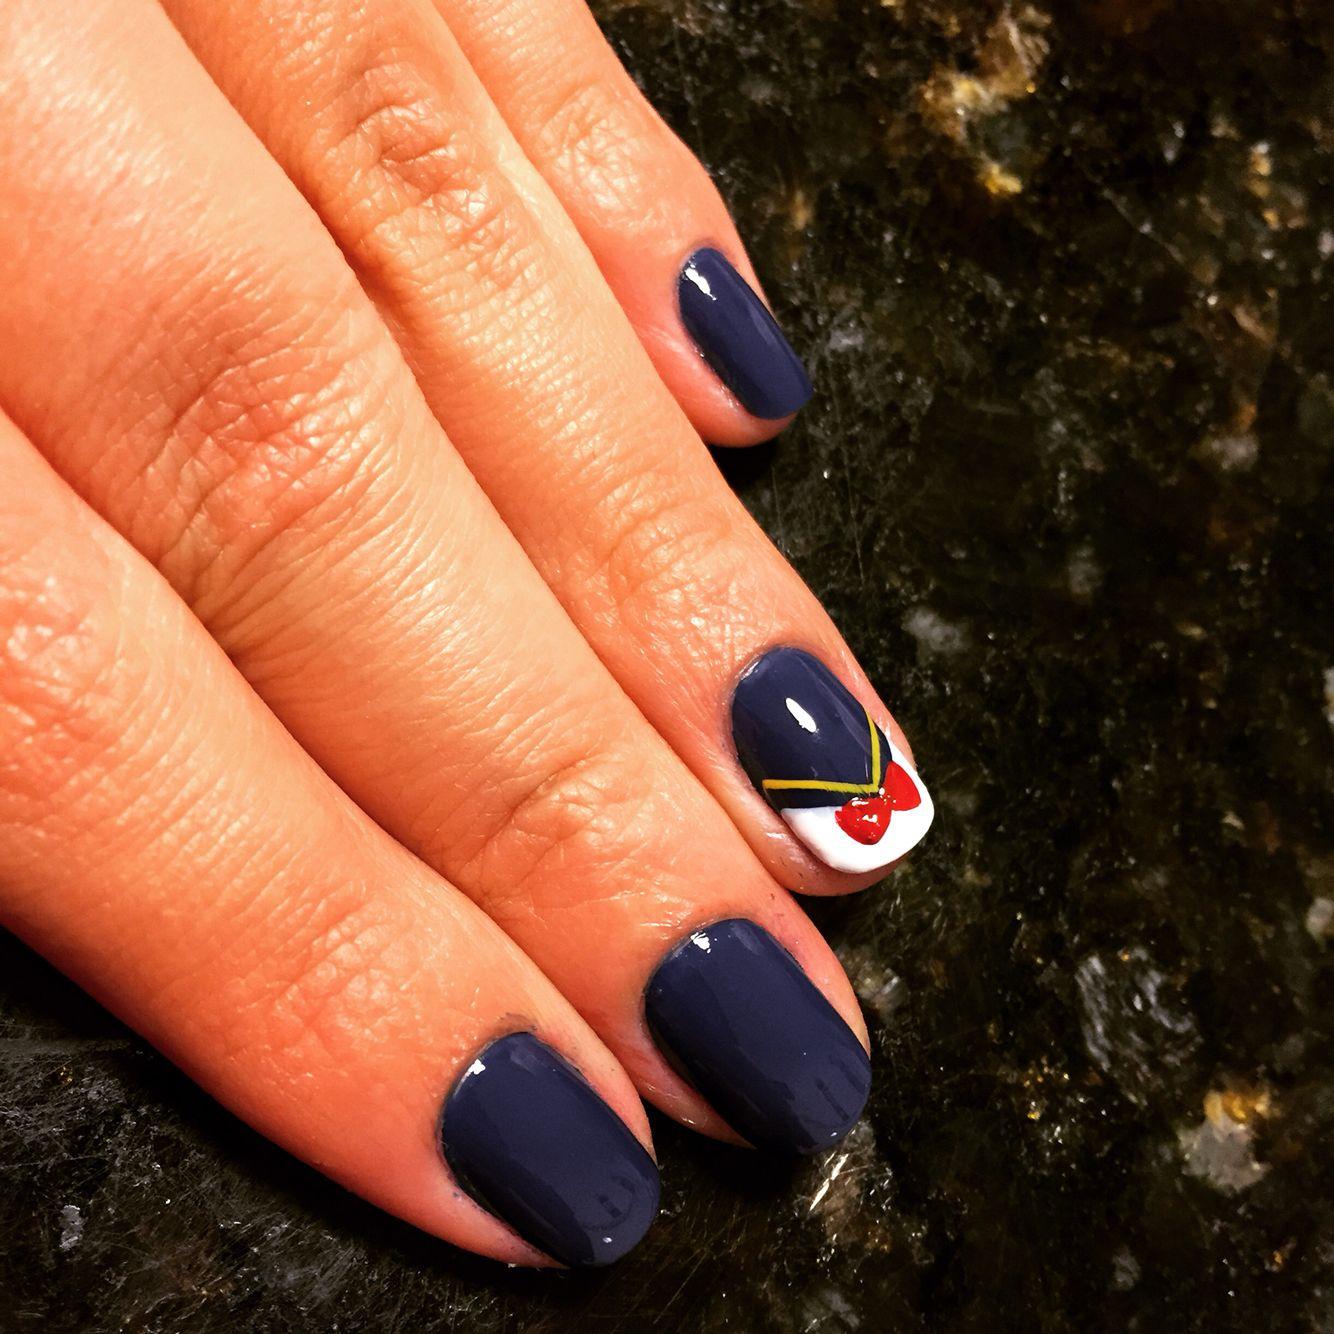 Donald duck nails | Nails Fun | Pinterest | Duck nails, Donald duck ...